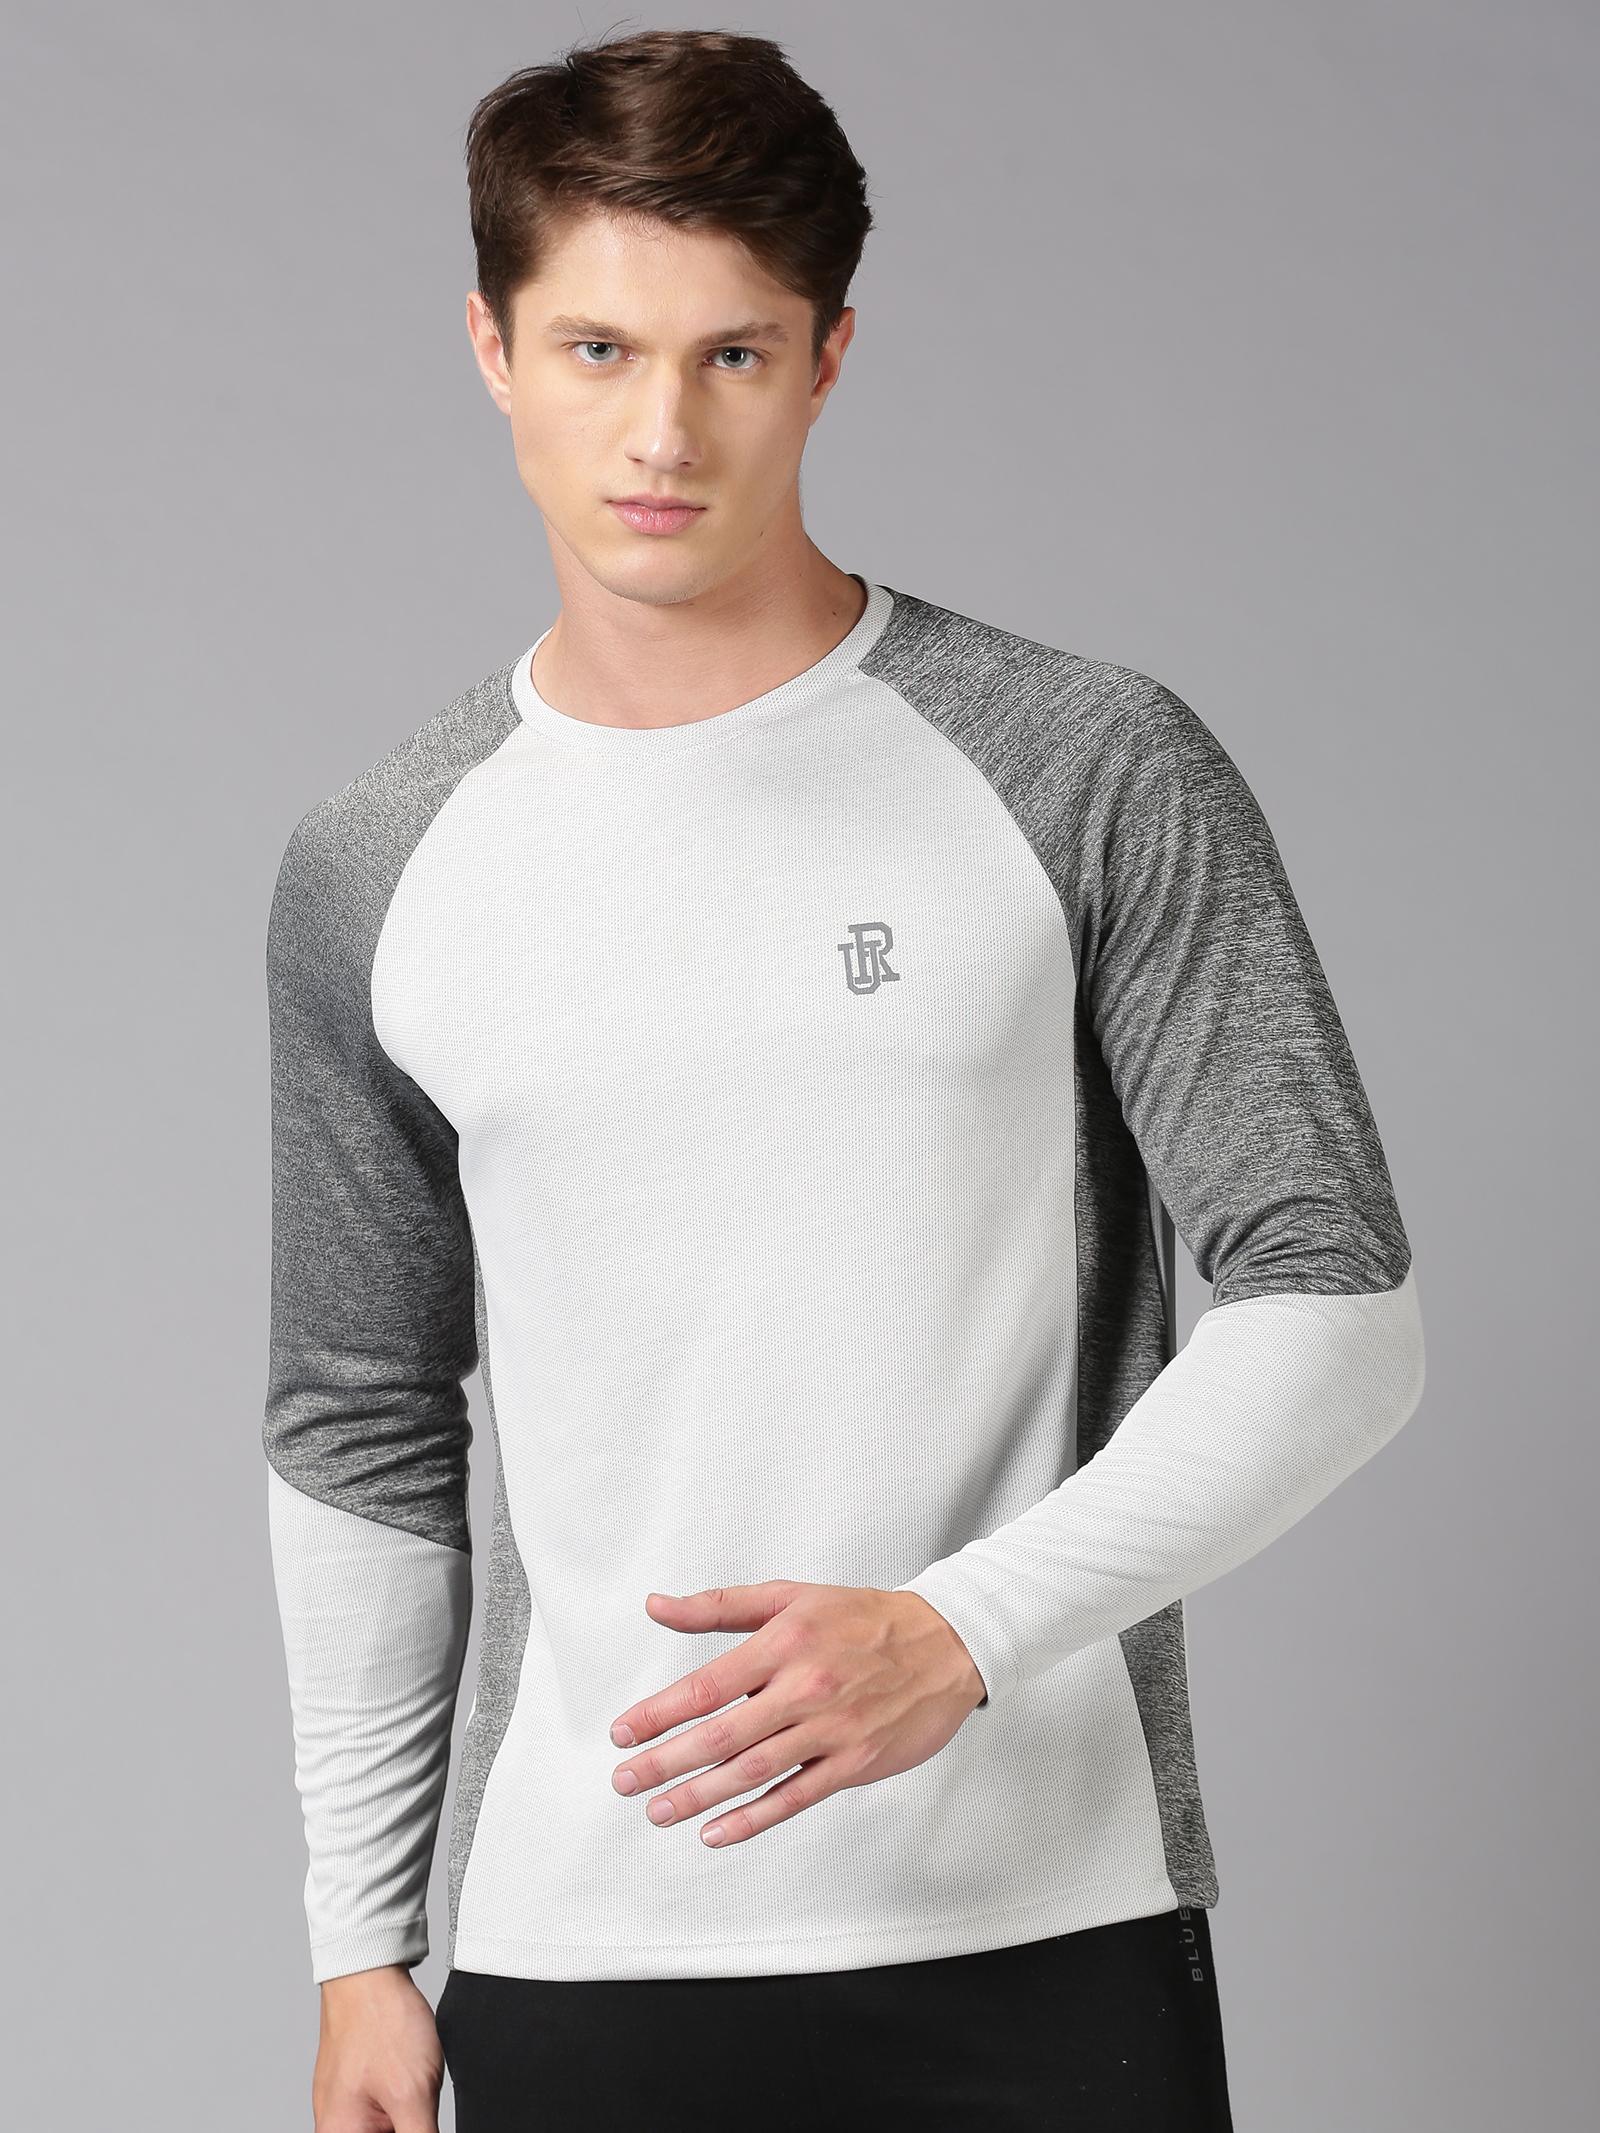 UrGear | UrGear Color Block Men Round Neck Grey T-Shirt